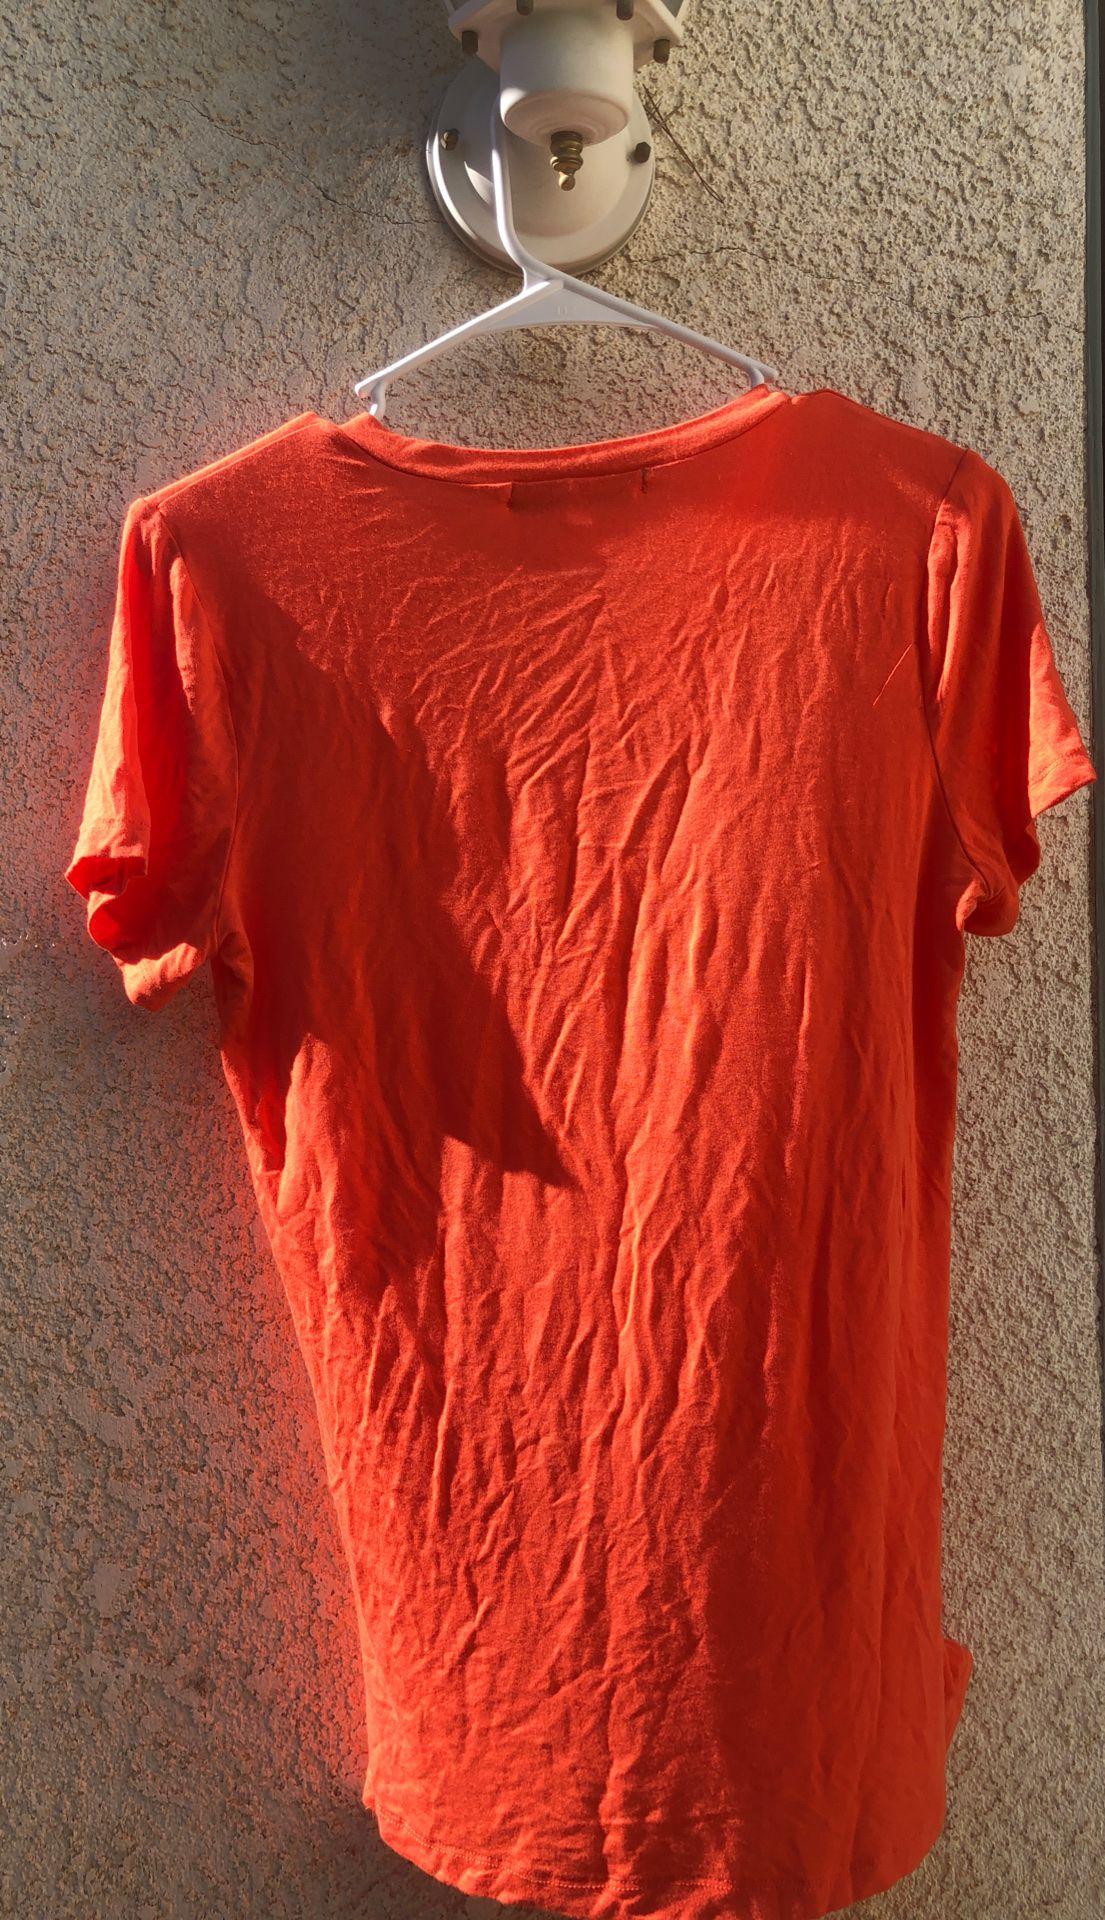 Women's small orange V-neck top